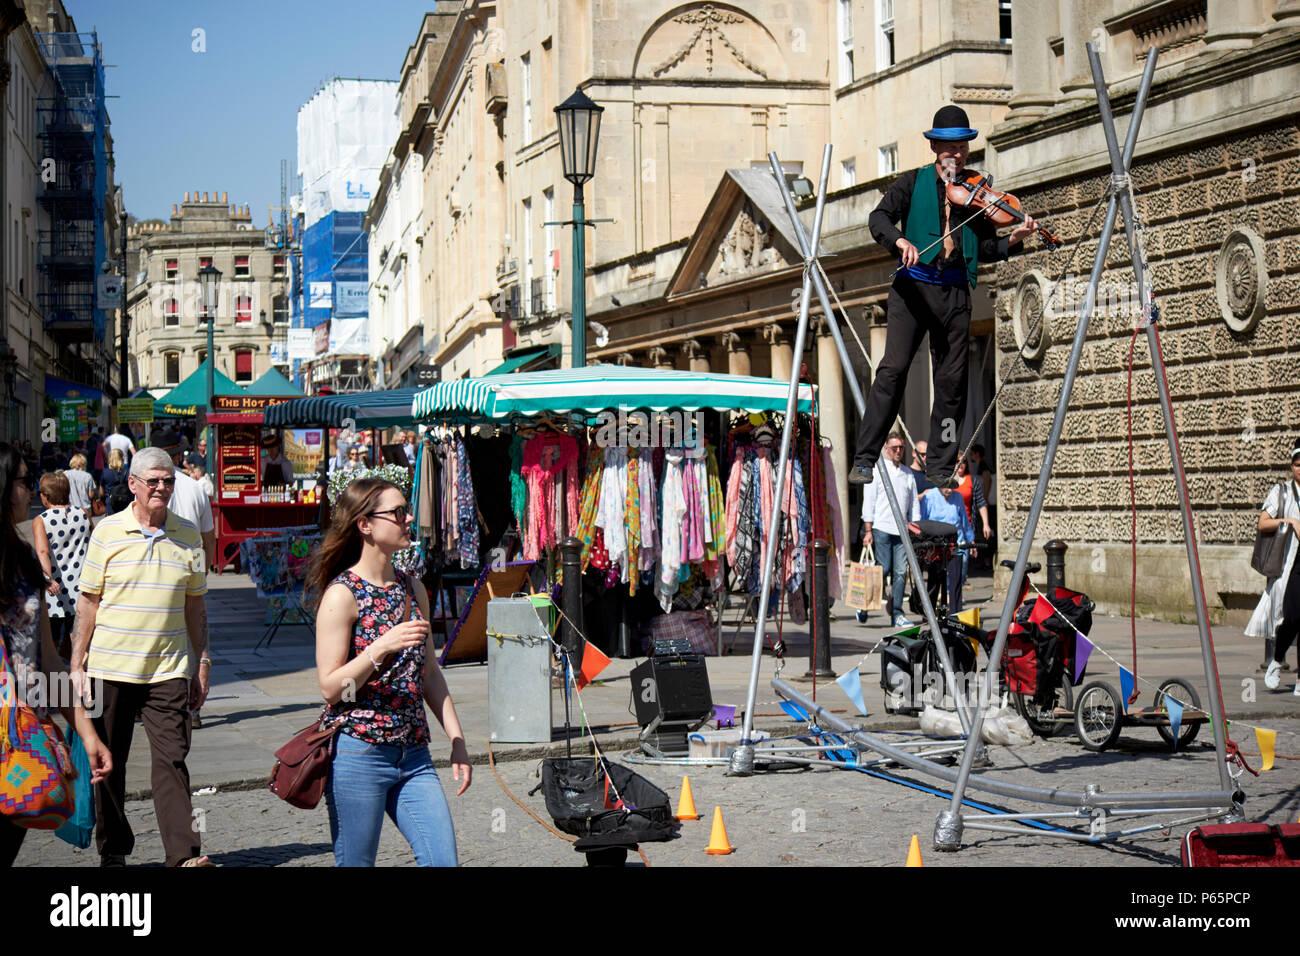 tightrope walker street entertainer on stall street Bath England UK - Stock Image